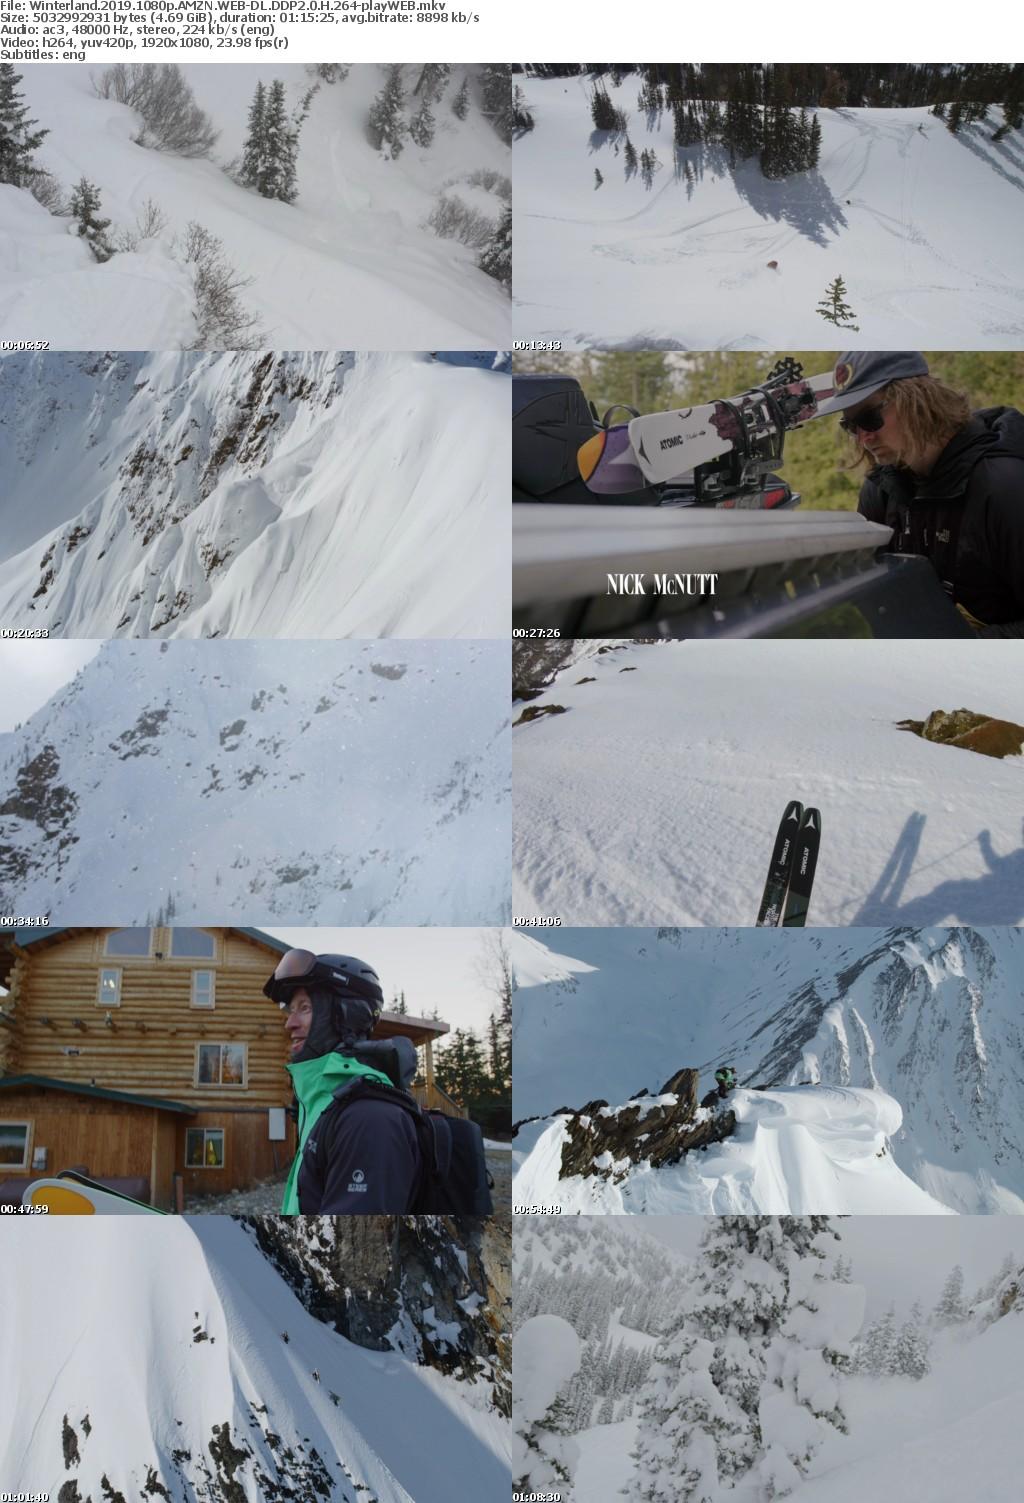 Winterland 2019 1080p AMZN WEBRip DDP2 0 x264-playWEB